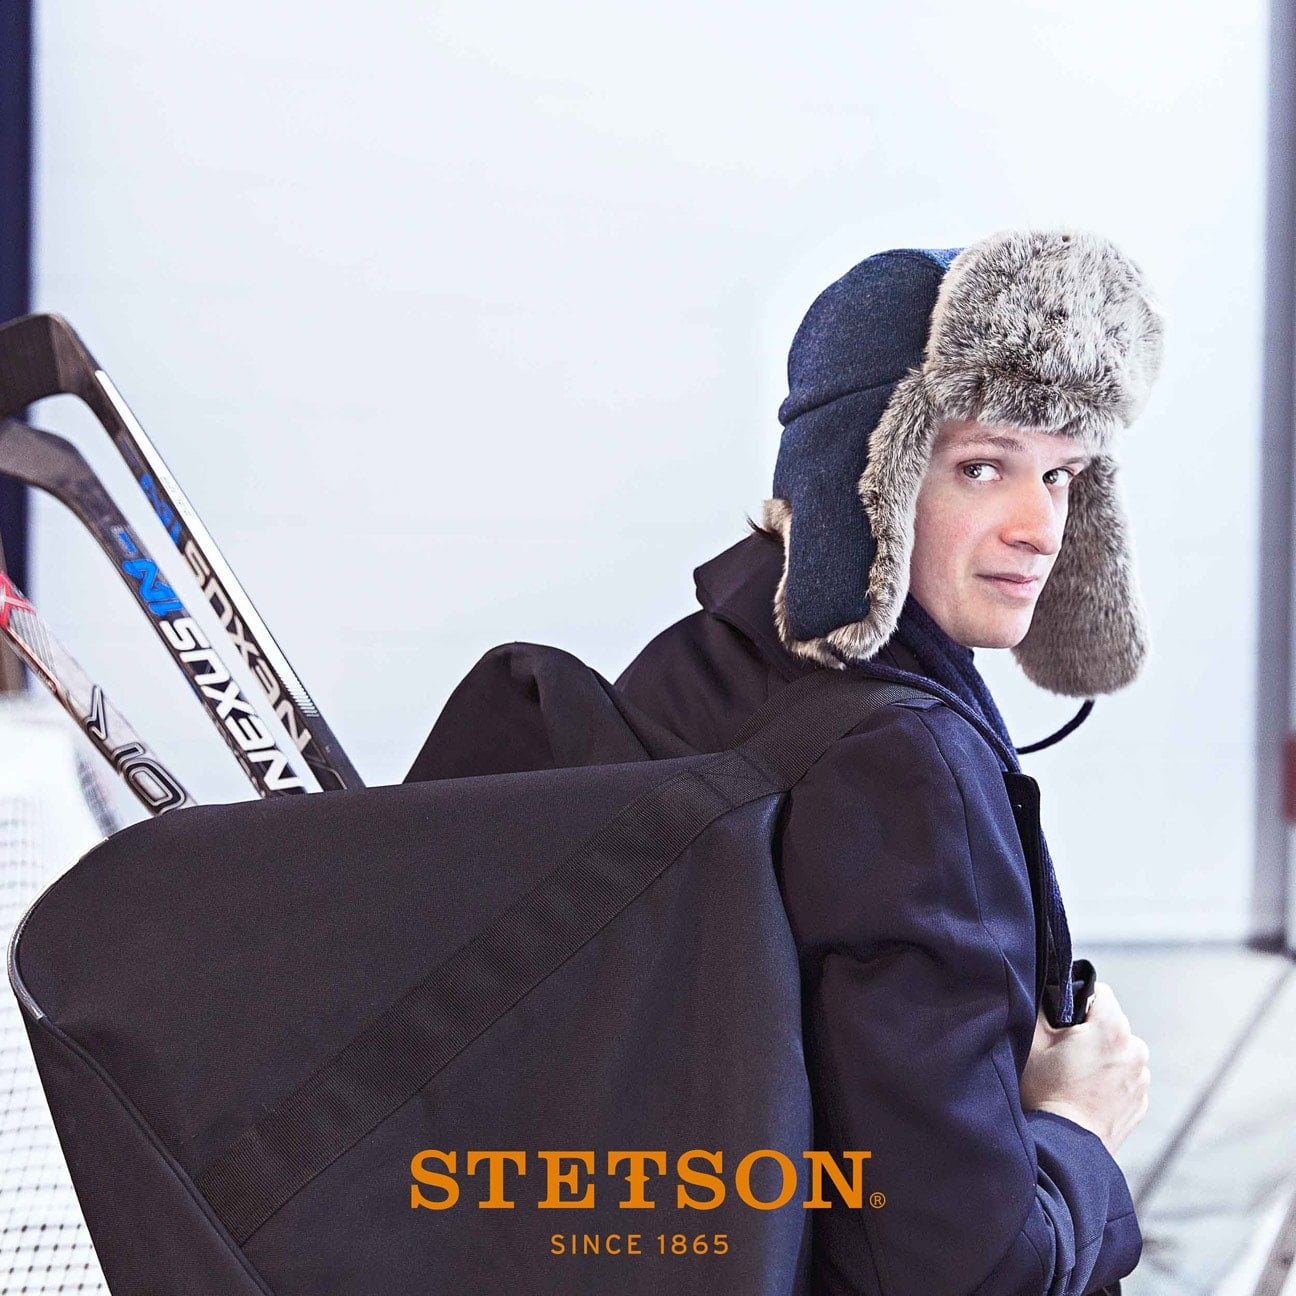 Gorro Aviador Alaska Wool by Stetson - Gorros - sombreroshop.es 391f8ac6d6e